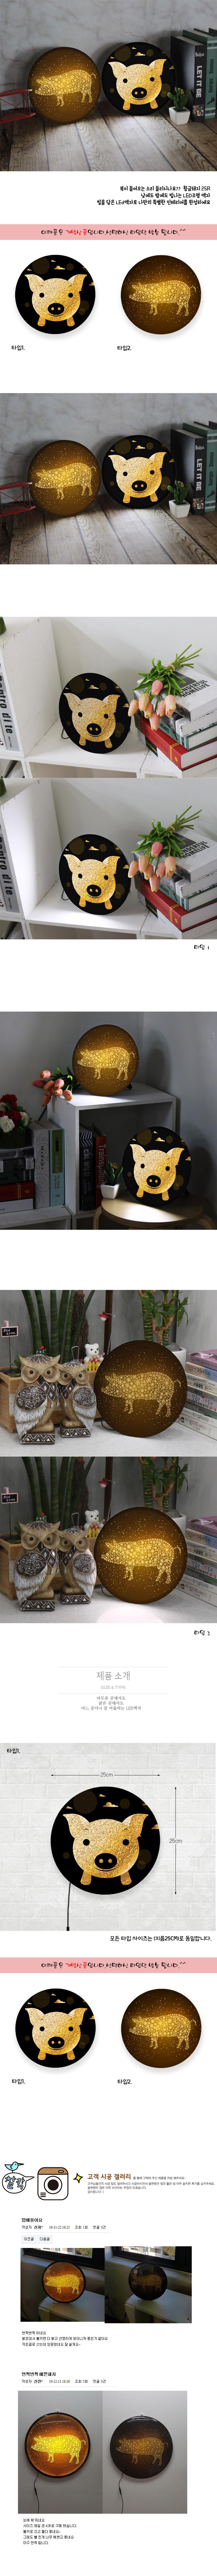 LED액자25R_황금돼지 - 꾸밈, 48,000원, 포인트조명, 터치조명